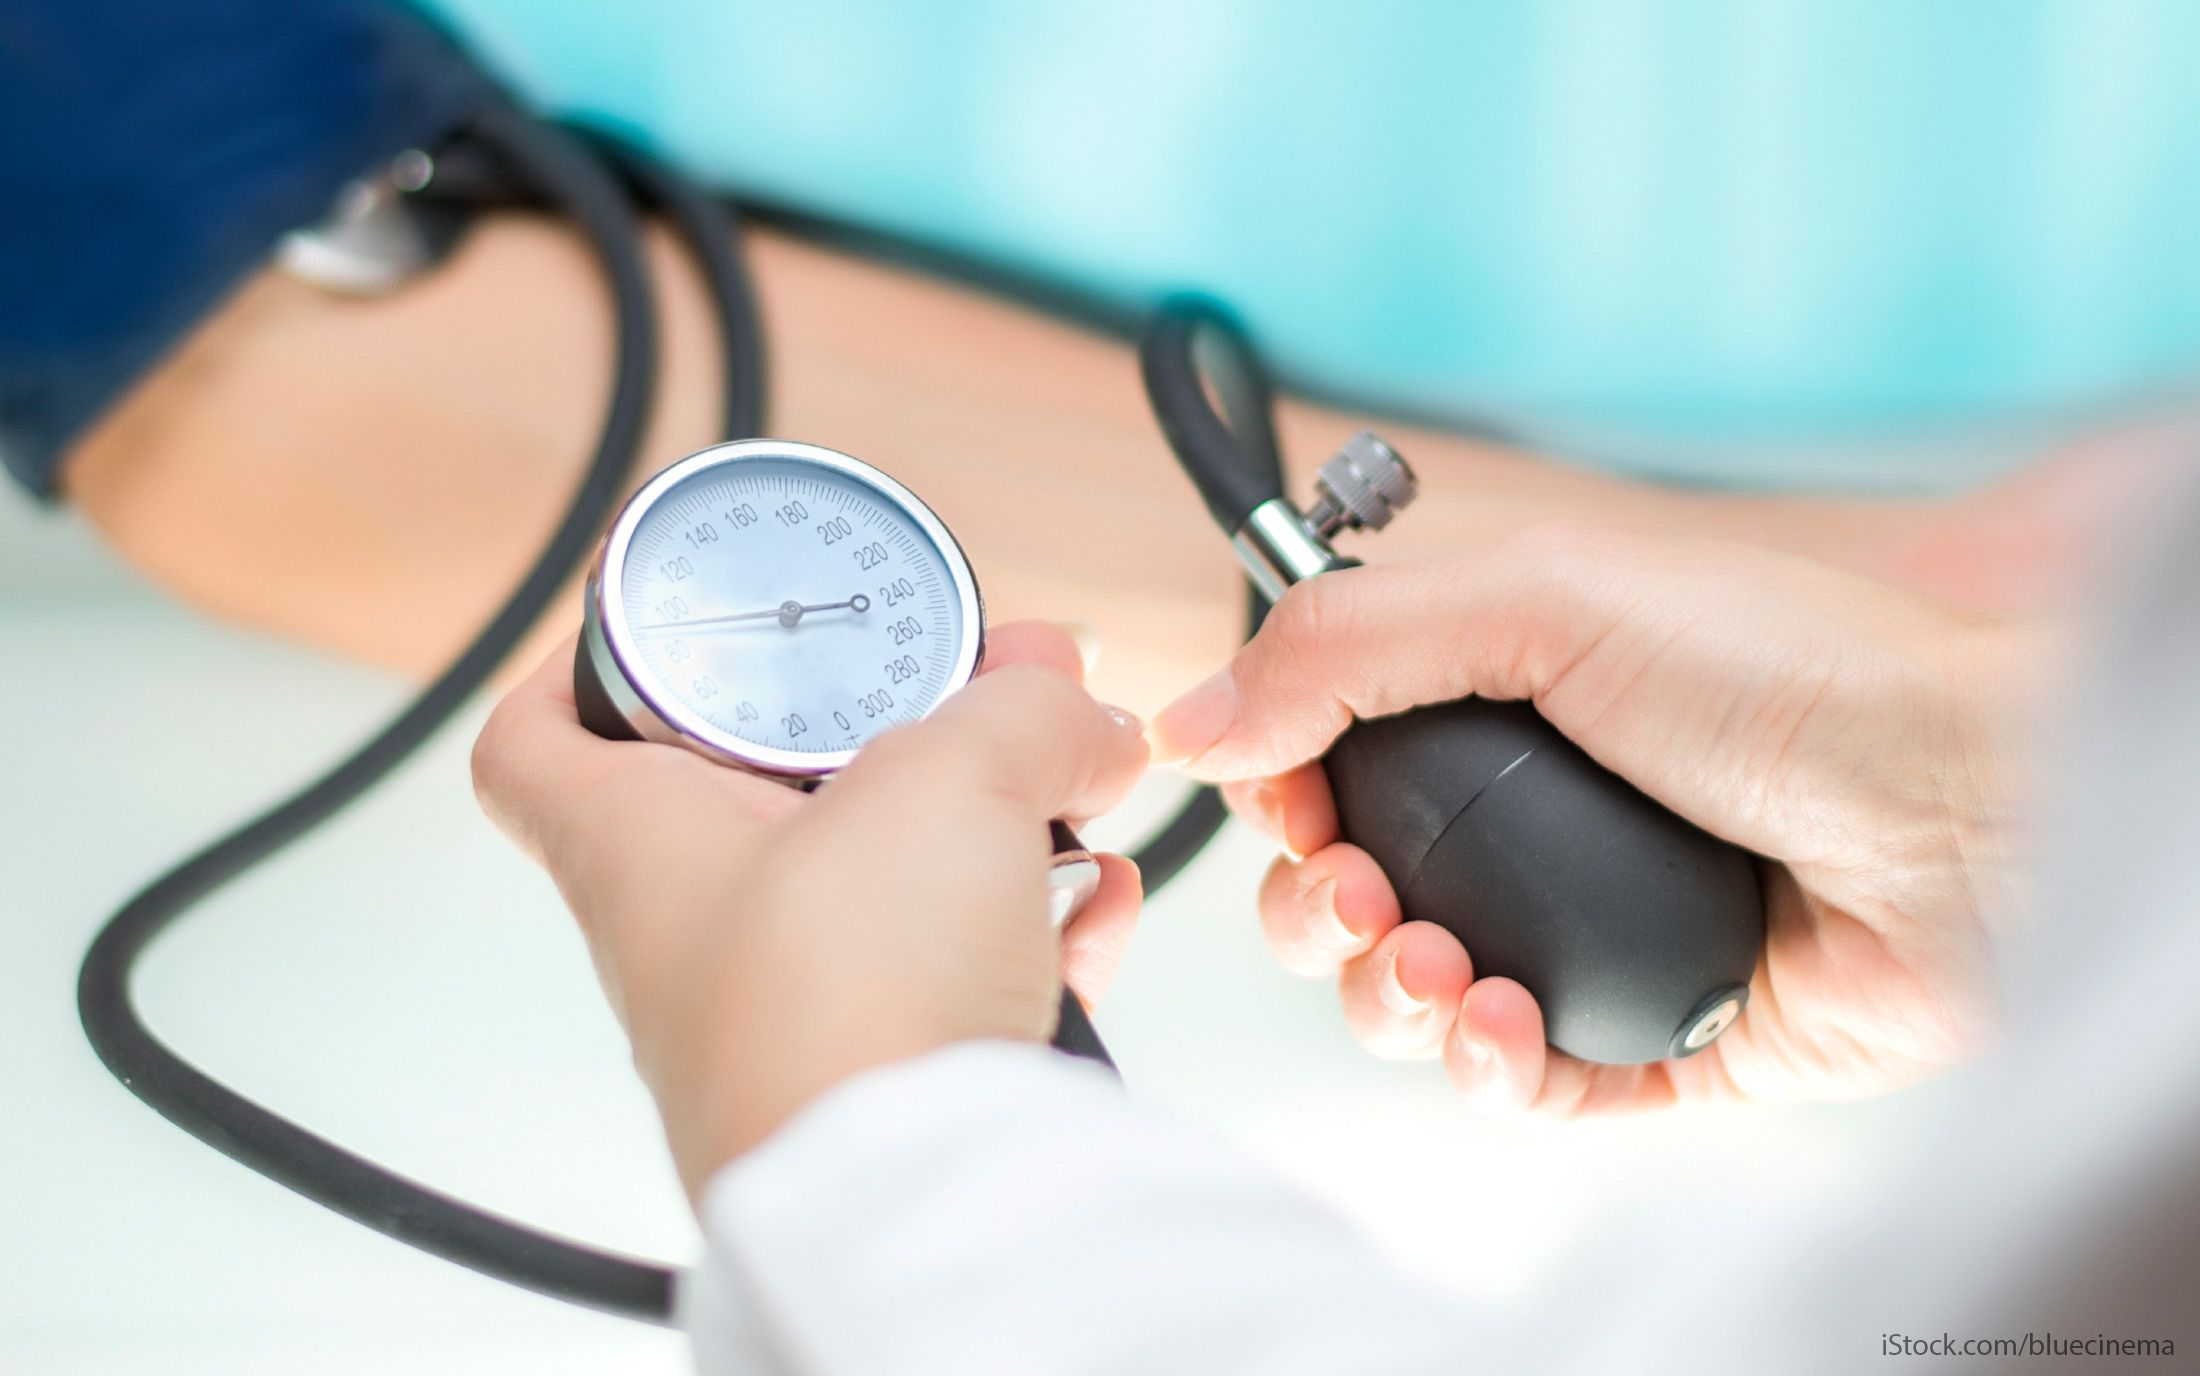 Sams club free health screening